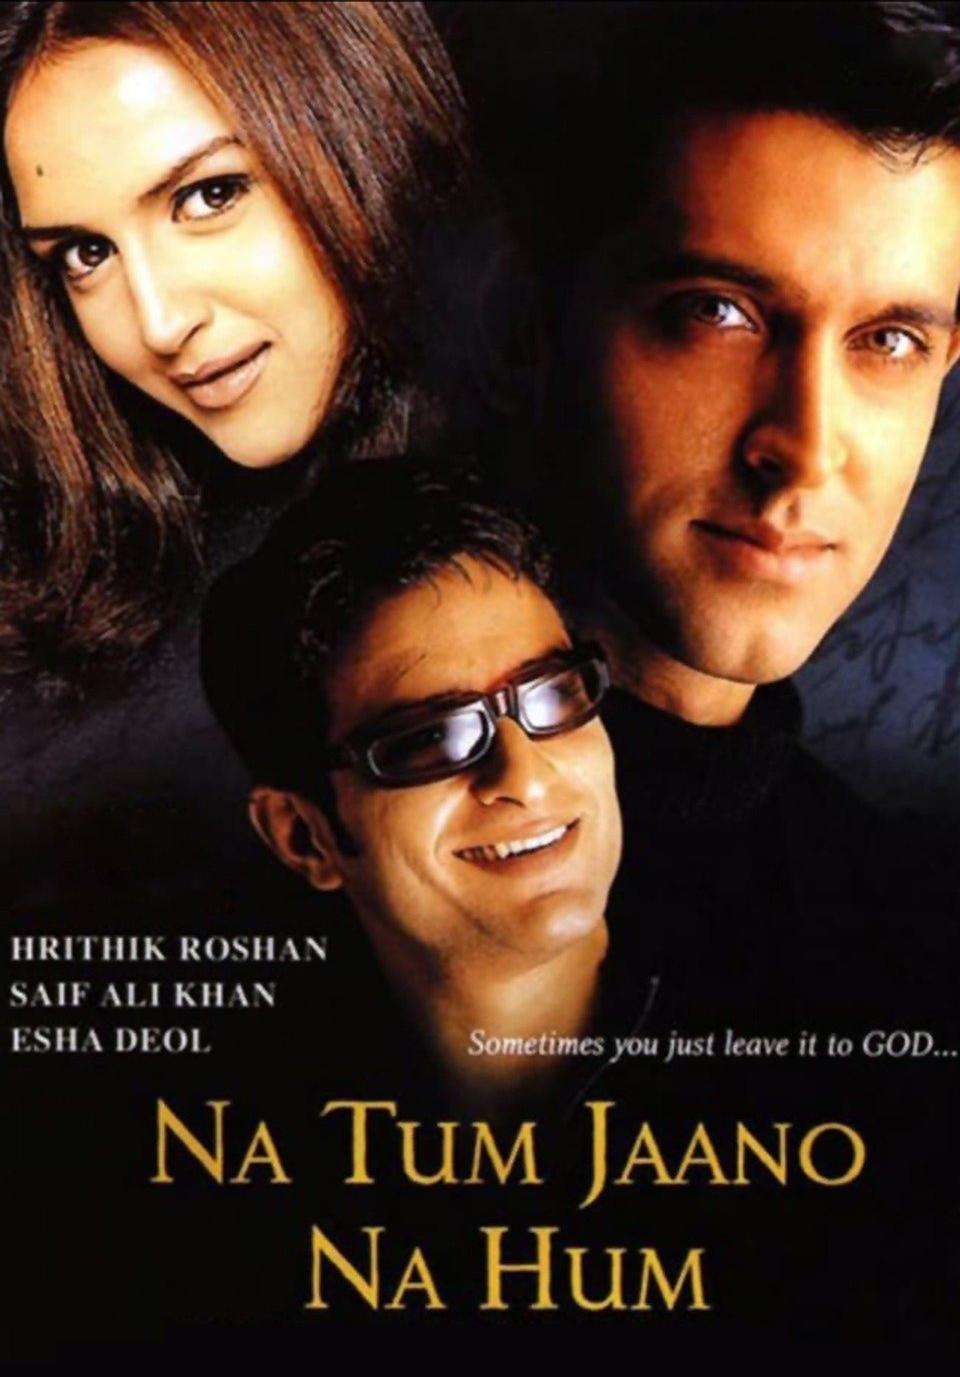 IMDb Seen: Alok Nath - IMDb